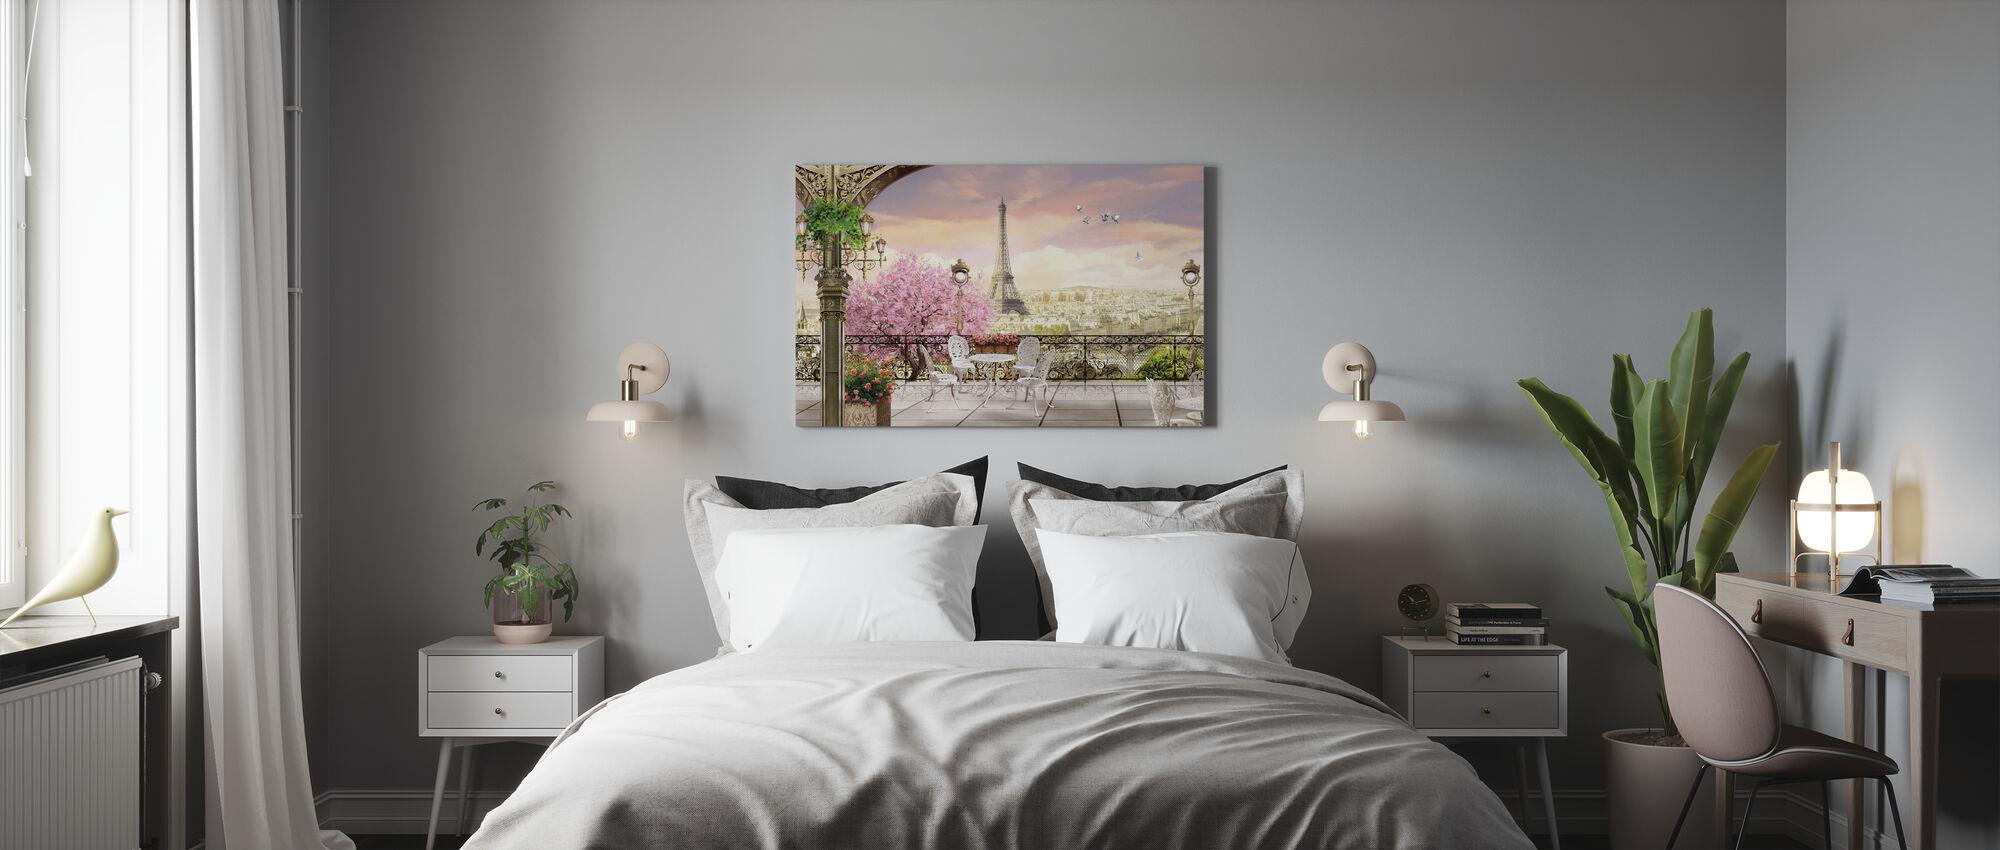 Paris Terrace - Canvas print - Bedroom